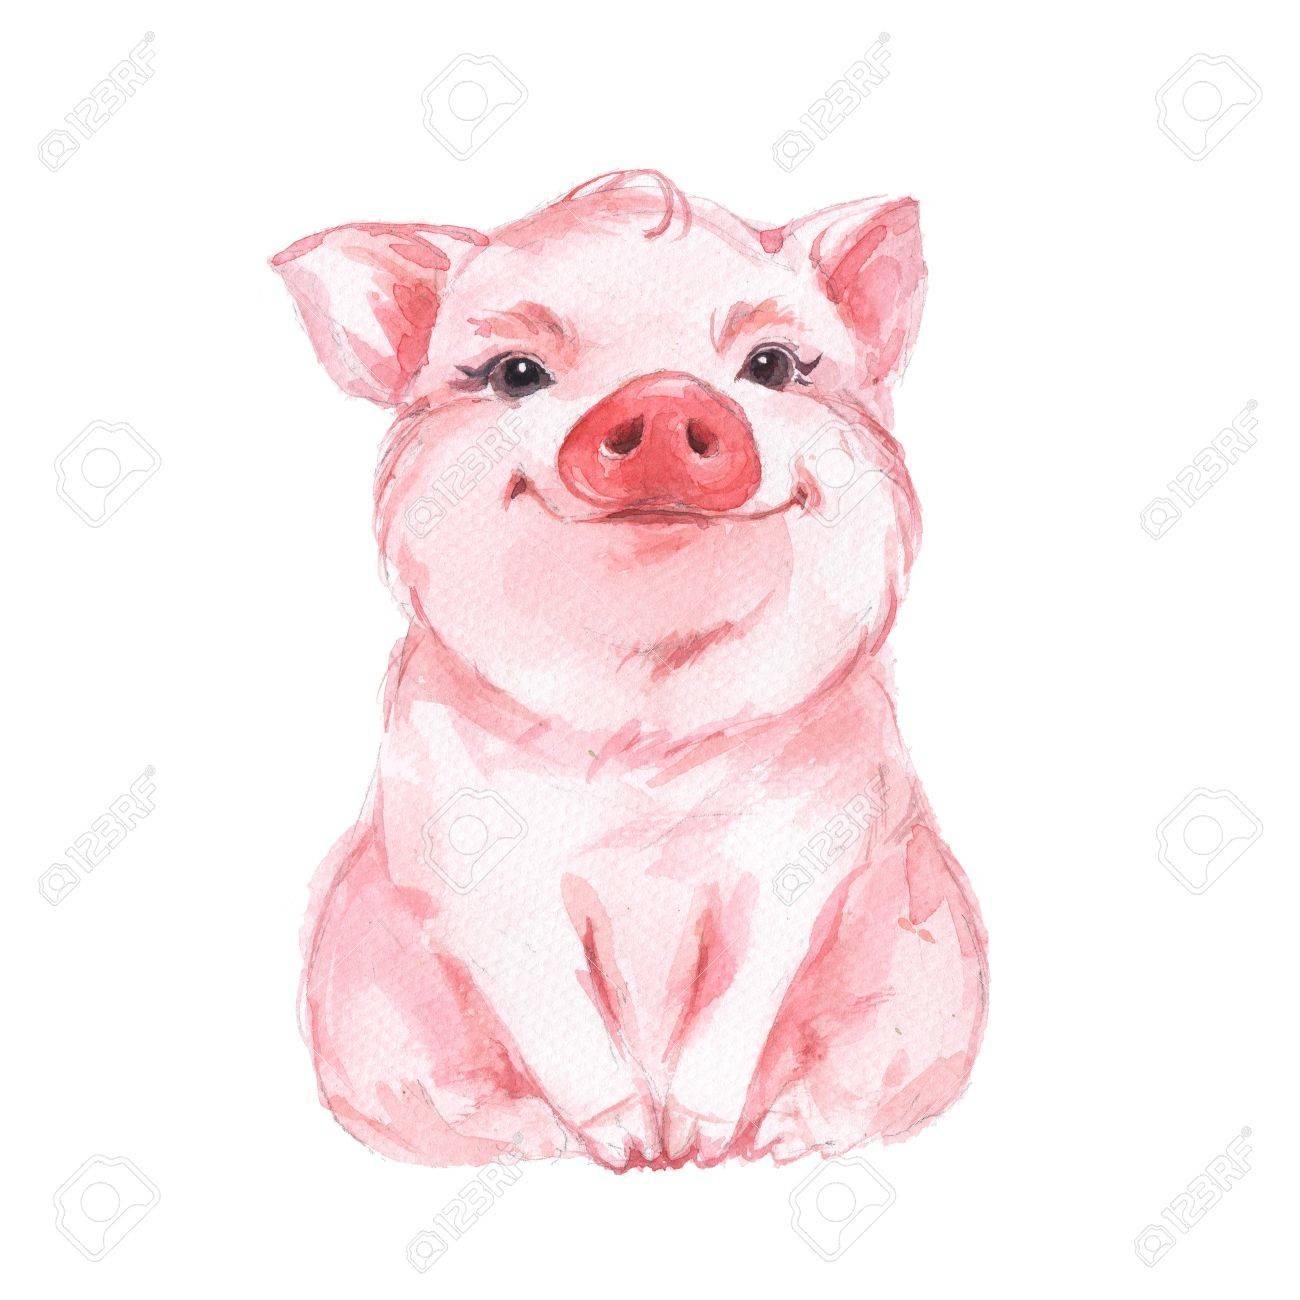 Funny pig. Cute watercolor illustration - 62199988